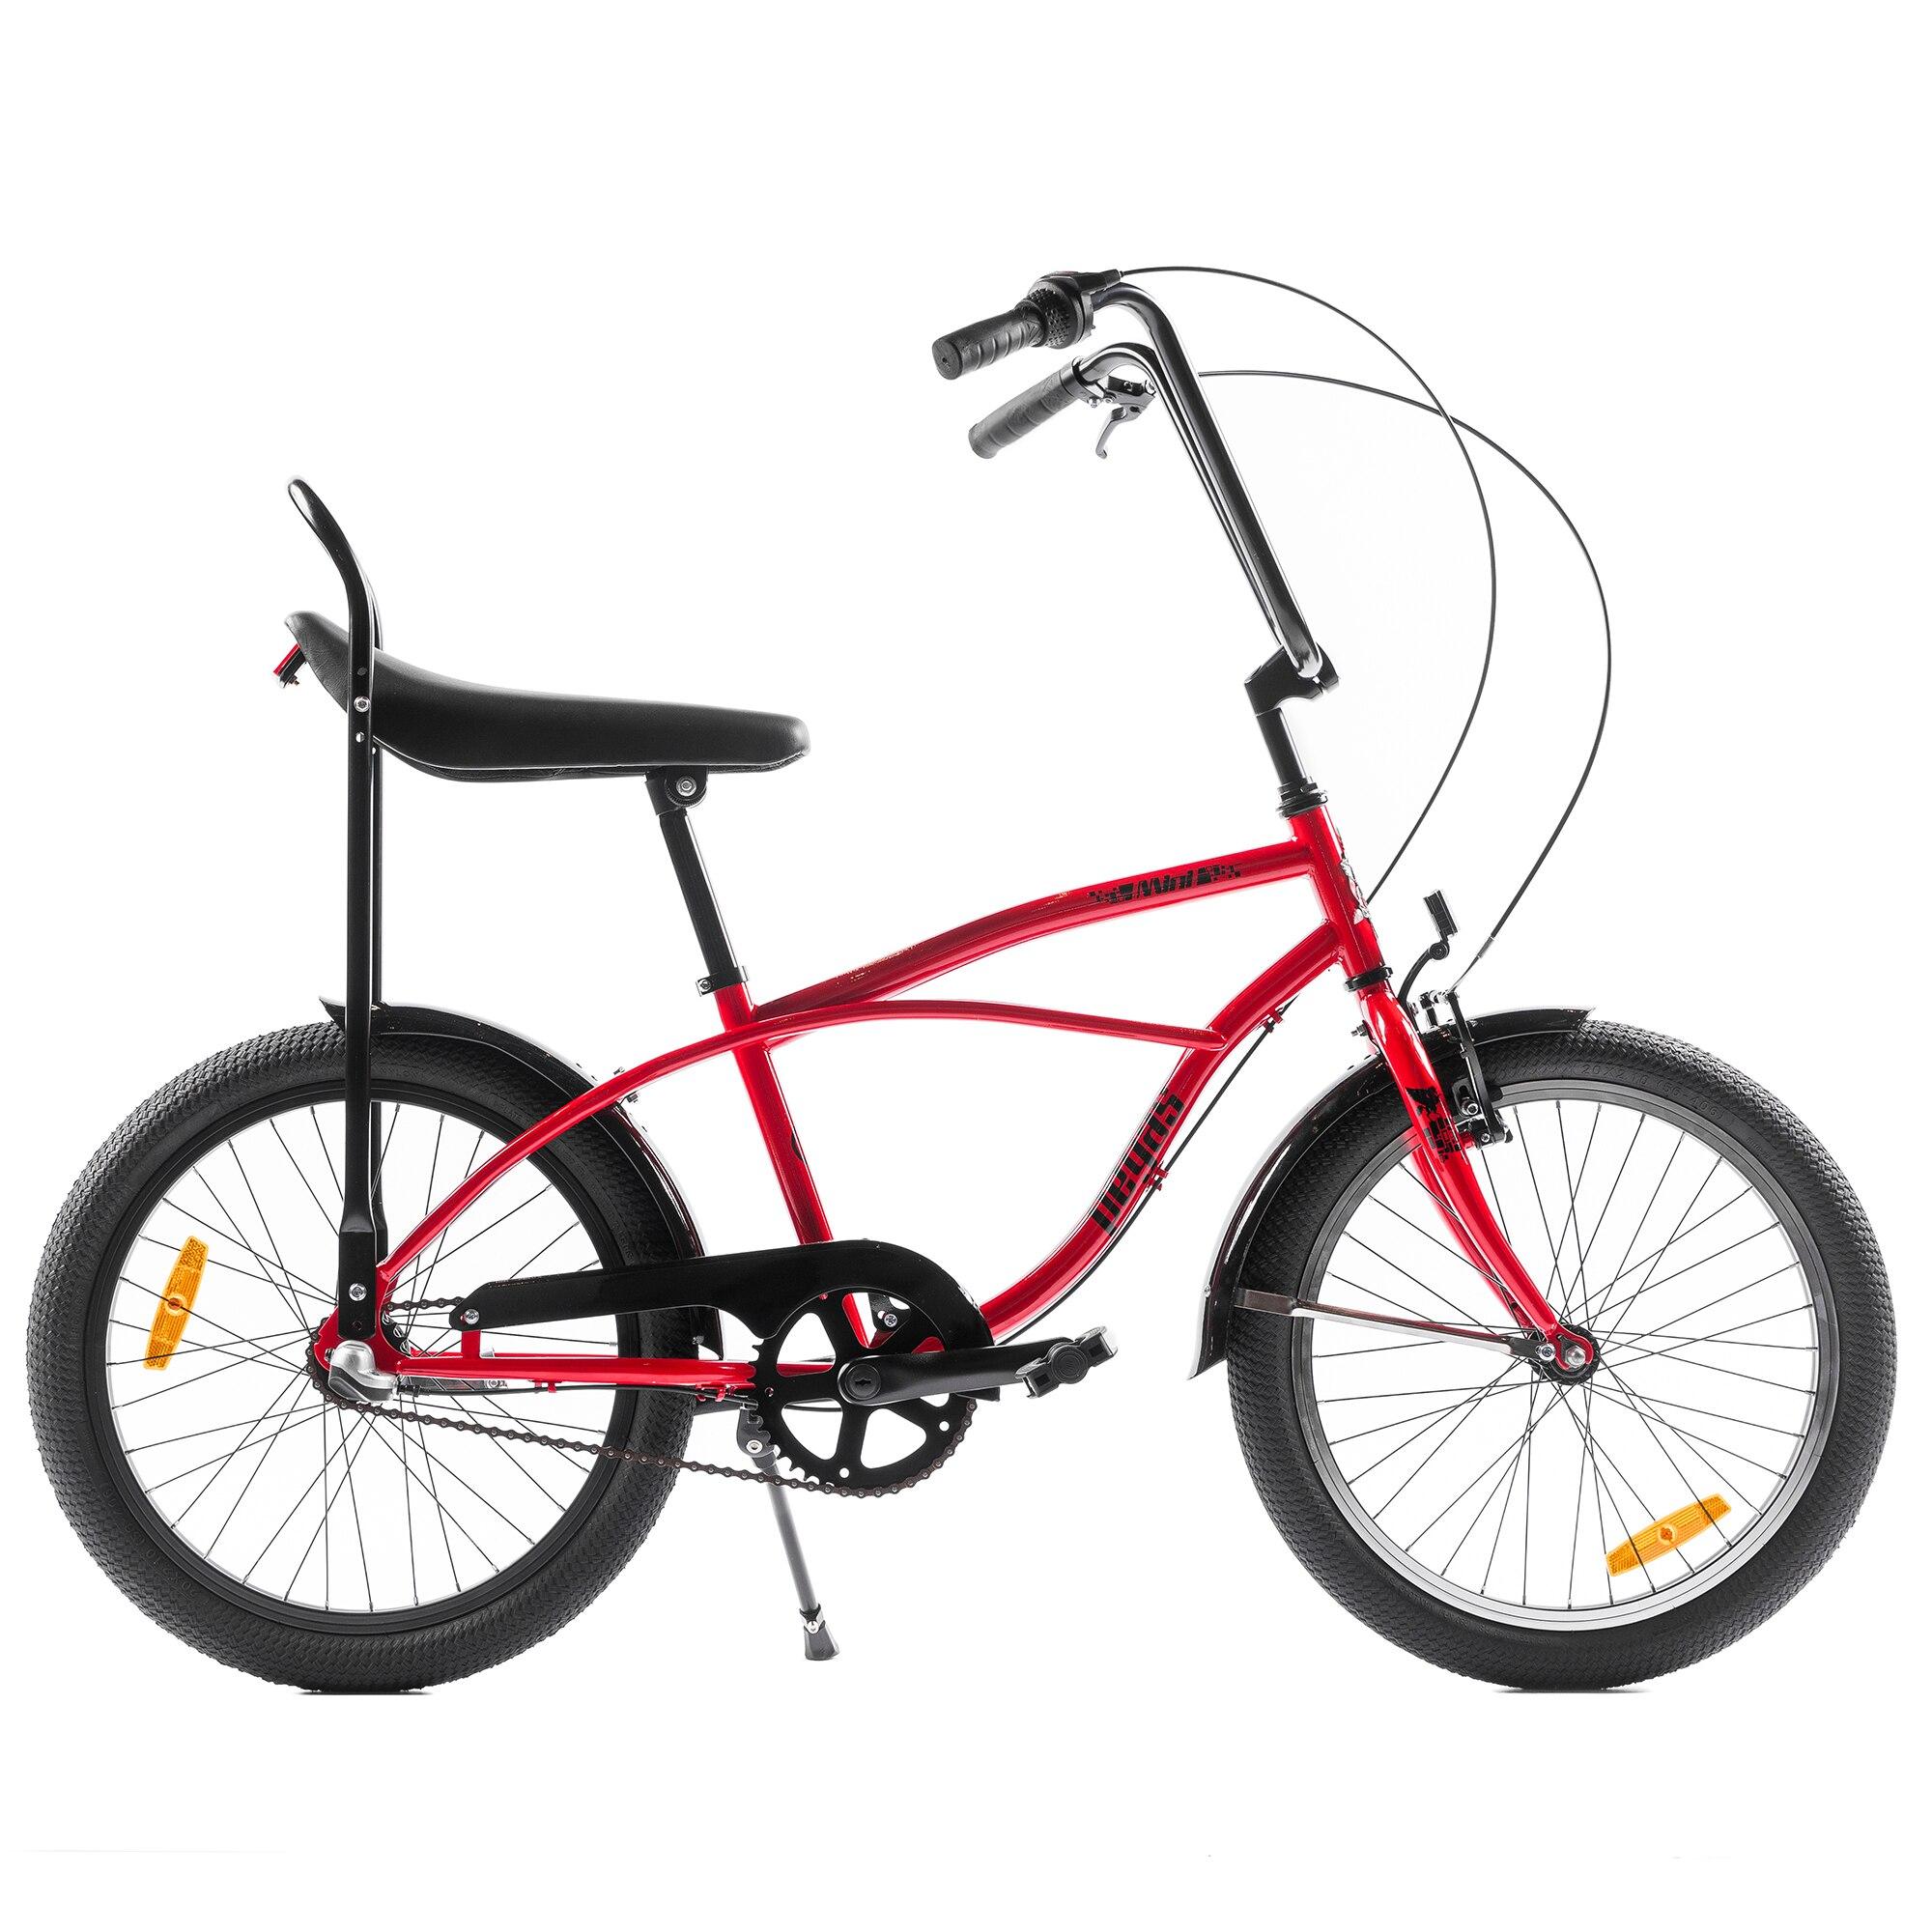 Fotografie Bicicleta Pegas Strada Mini, 3S, Rosu Bomboana